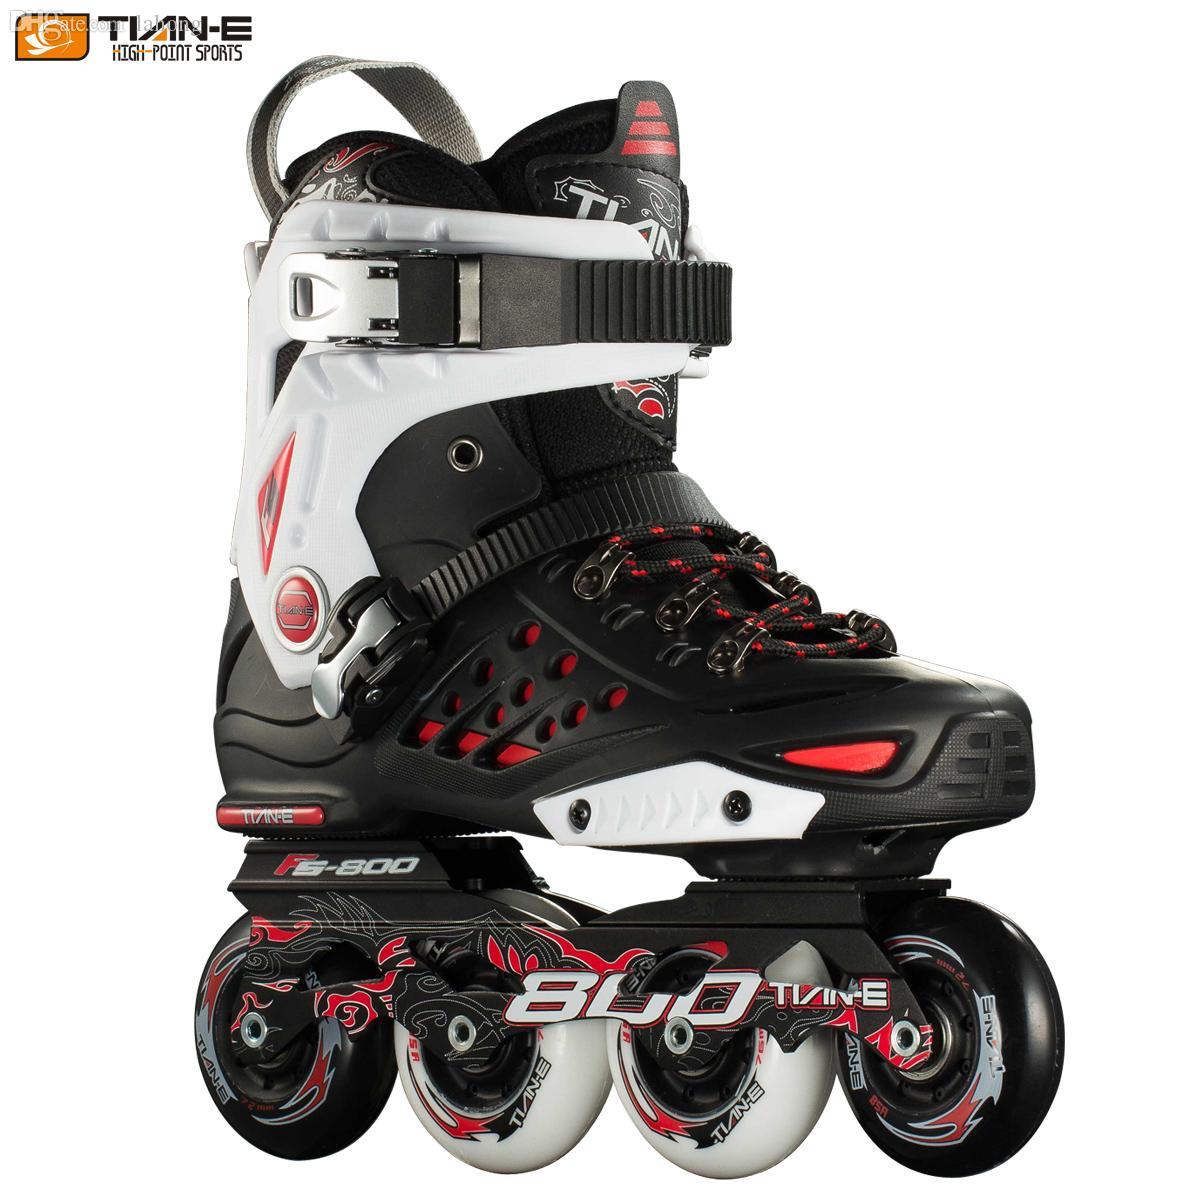 Roller shoes cheap - Online Cheap Wholesale Soft Adult Skates Skating Shoes Professional Slalom Skates Roller Skates By Simmer Dhgate Com